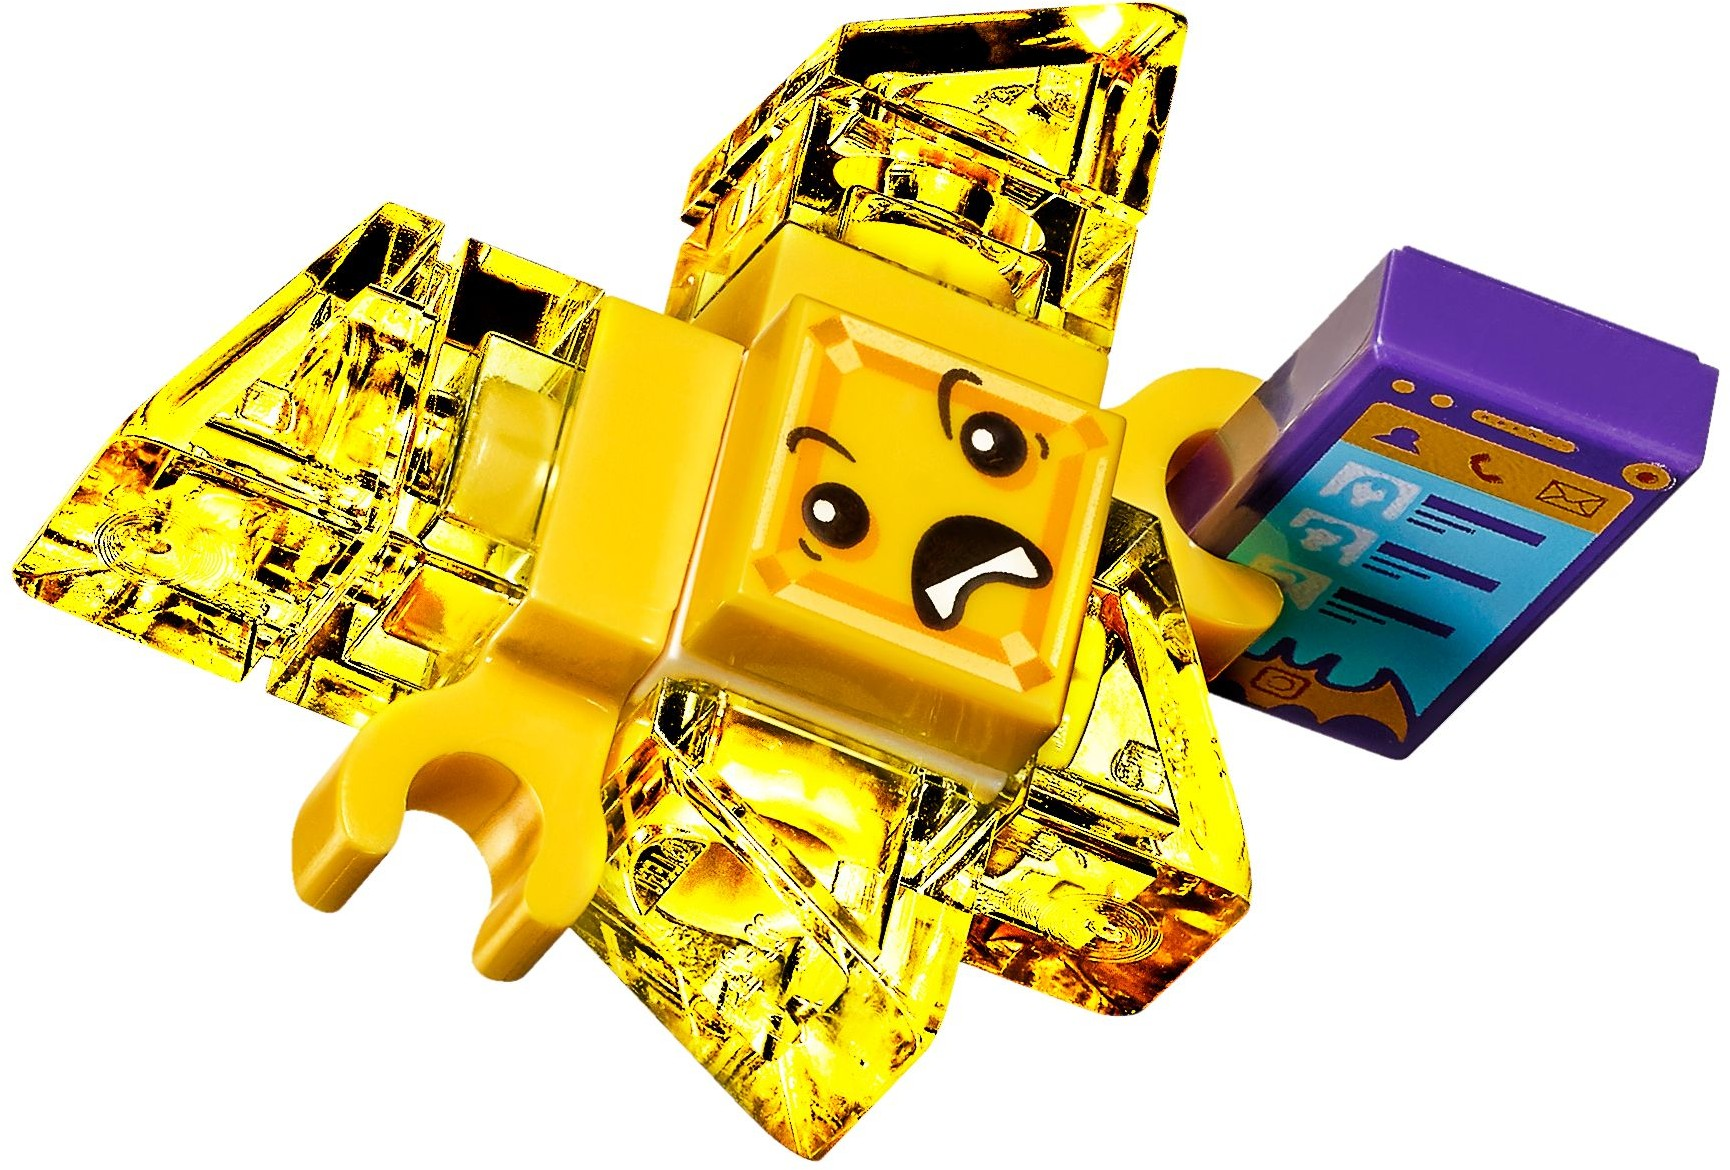 Mua đồ chơi LEGO 41230 - LEGO DC Super Hero Girls 41230 - Máy Bay Batjet của Batgirl (LEGO DC Super Hero Girls Batgirl Batjet Chase 41230)